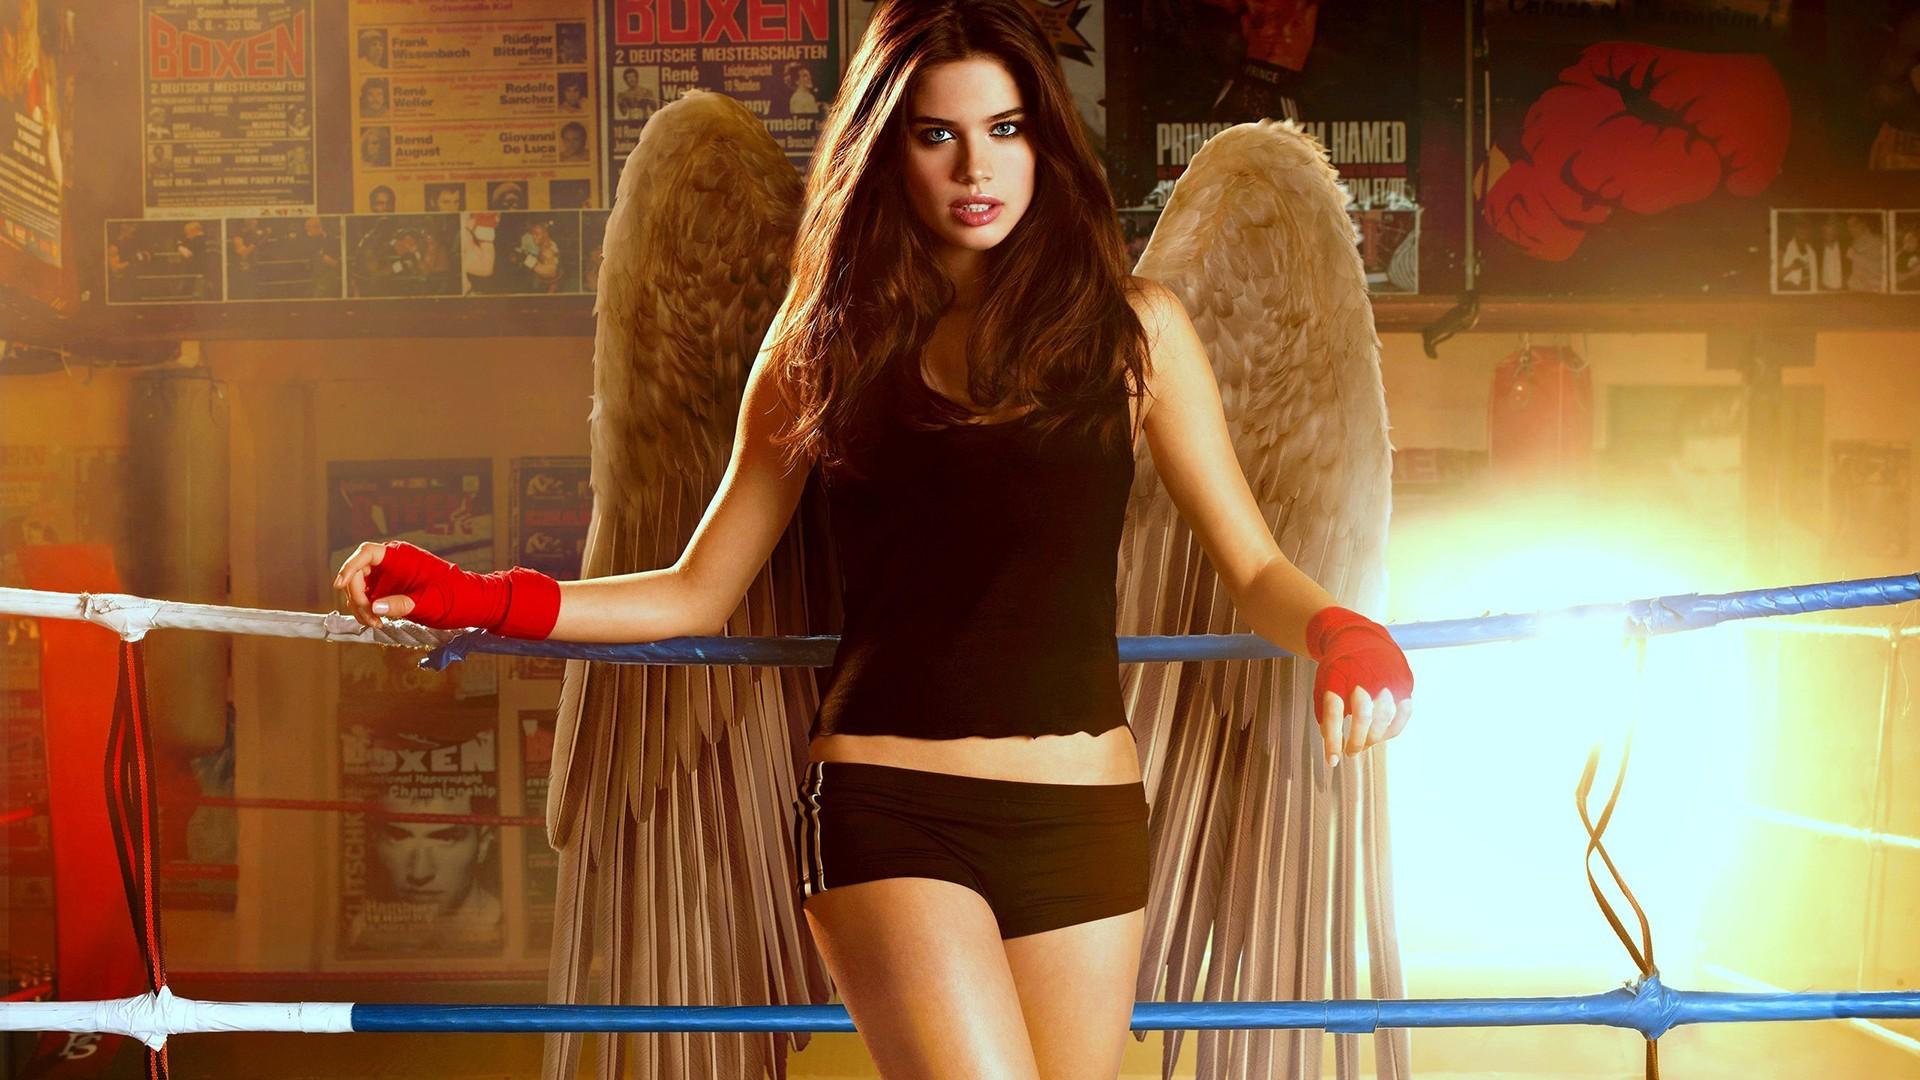 People 1920x1080 Sara Sampaio sportswear tight shorts brunette long hair model women woman angel supermodel